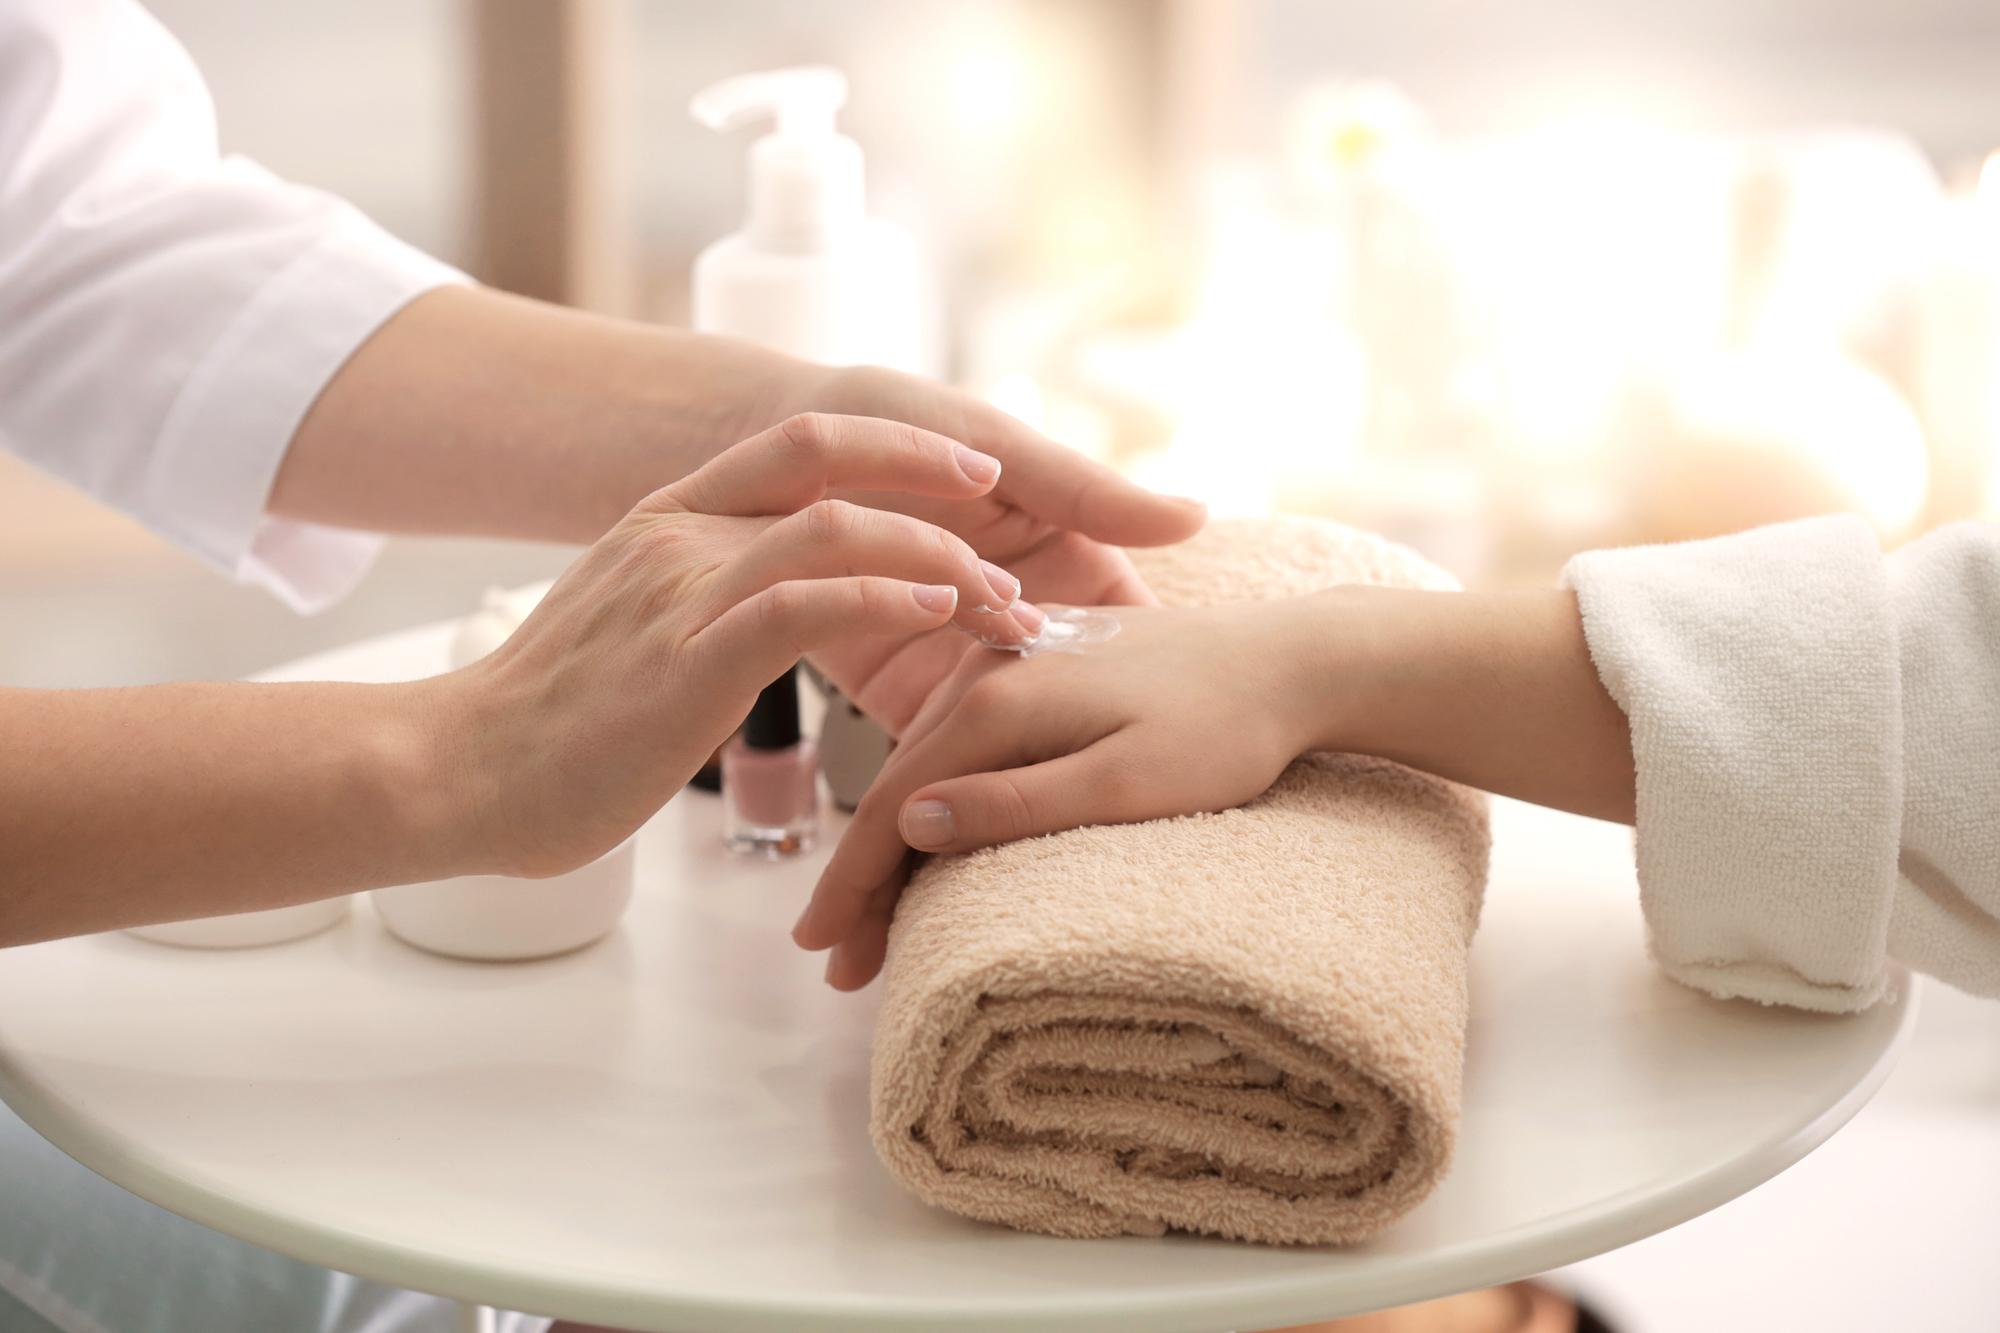 Mani-Pedi- Manicure & Pedicure- Sufii Day Spa Nail Salon- Orlandos Best Nail Spa